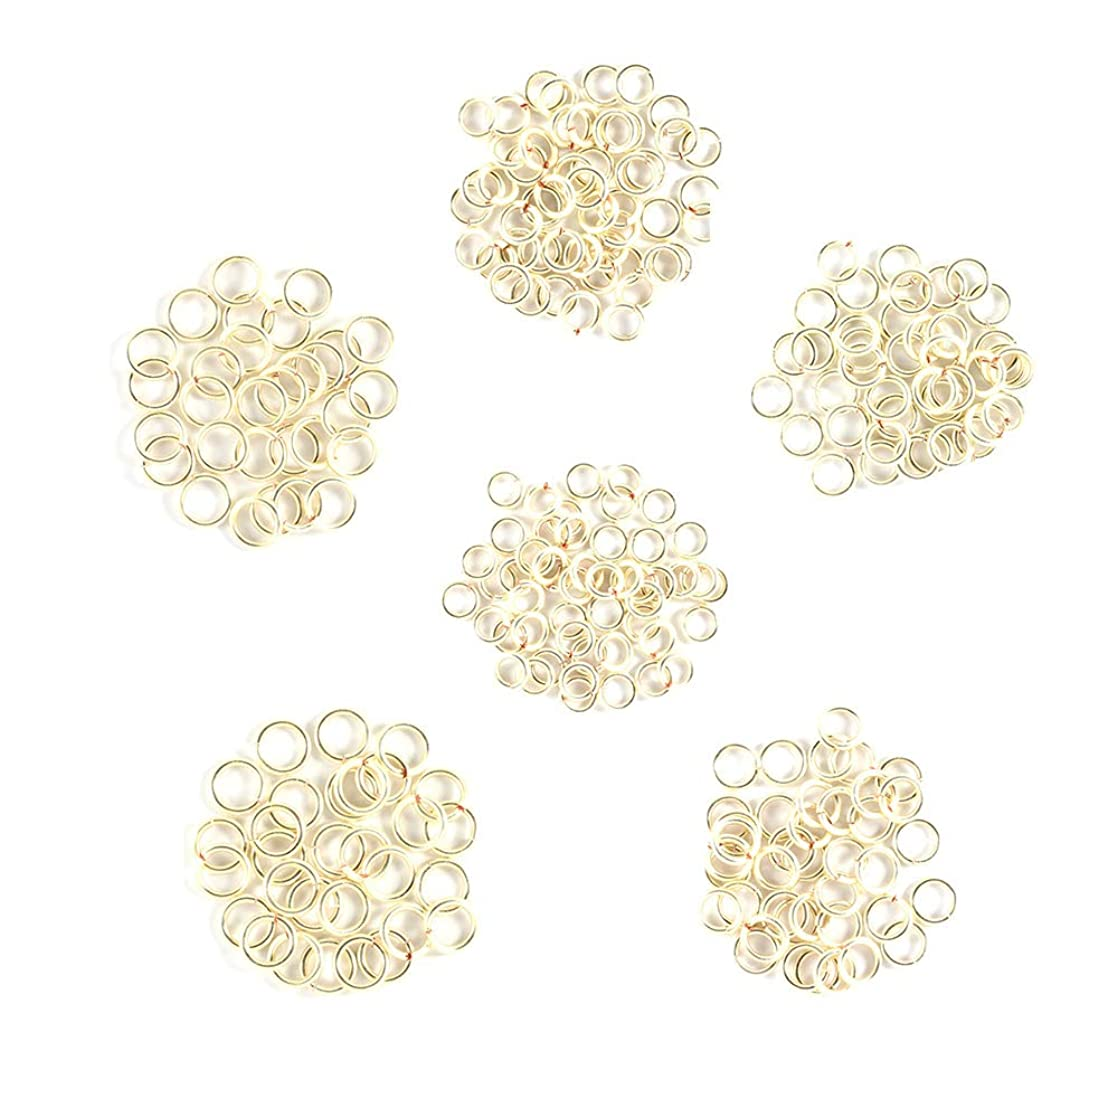 Silver - Enameled Copper Jump Rings – 14 Gauge – 5.0mm to 7.5 mm ID - 120 Rings kglawumt55891